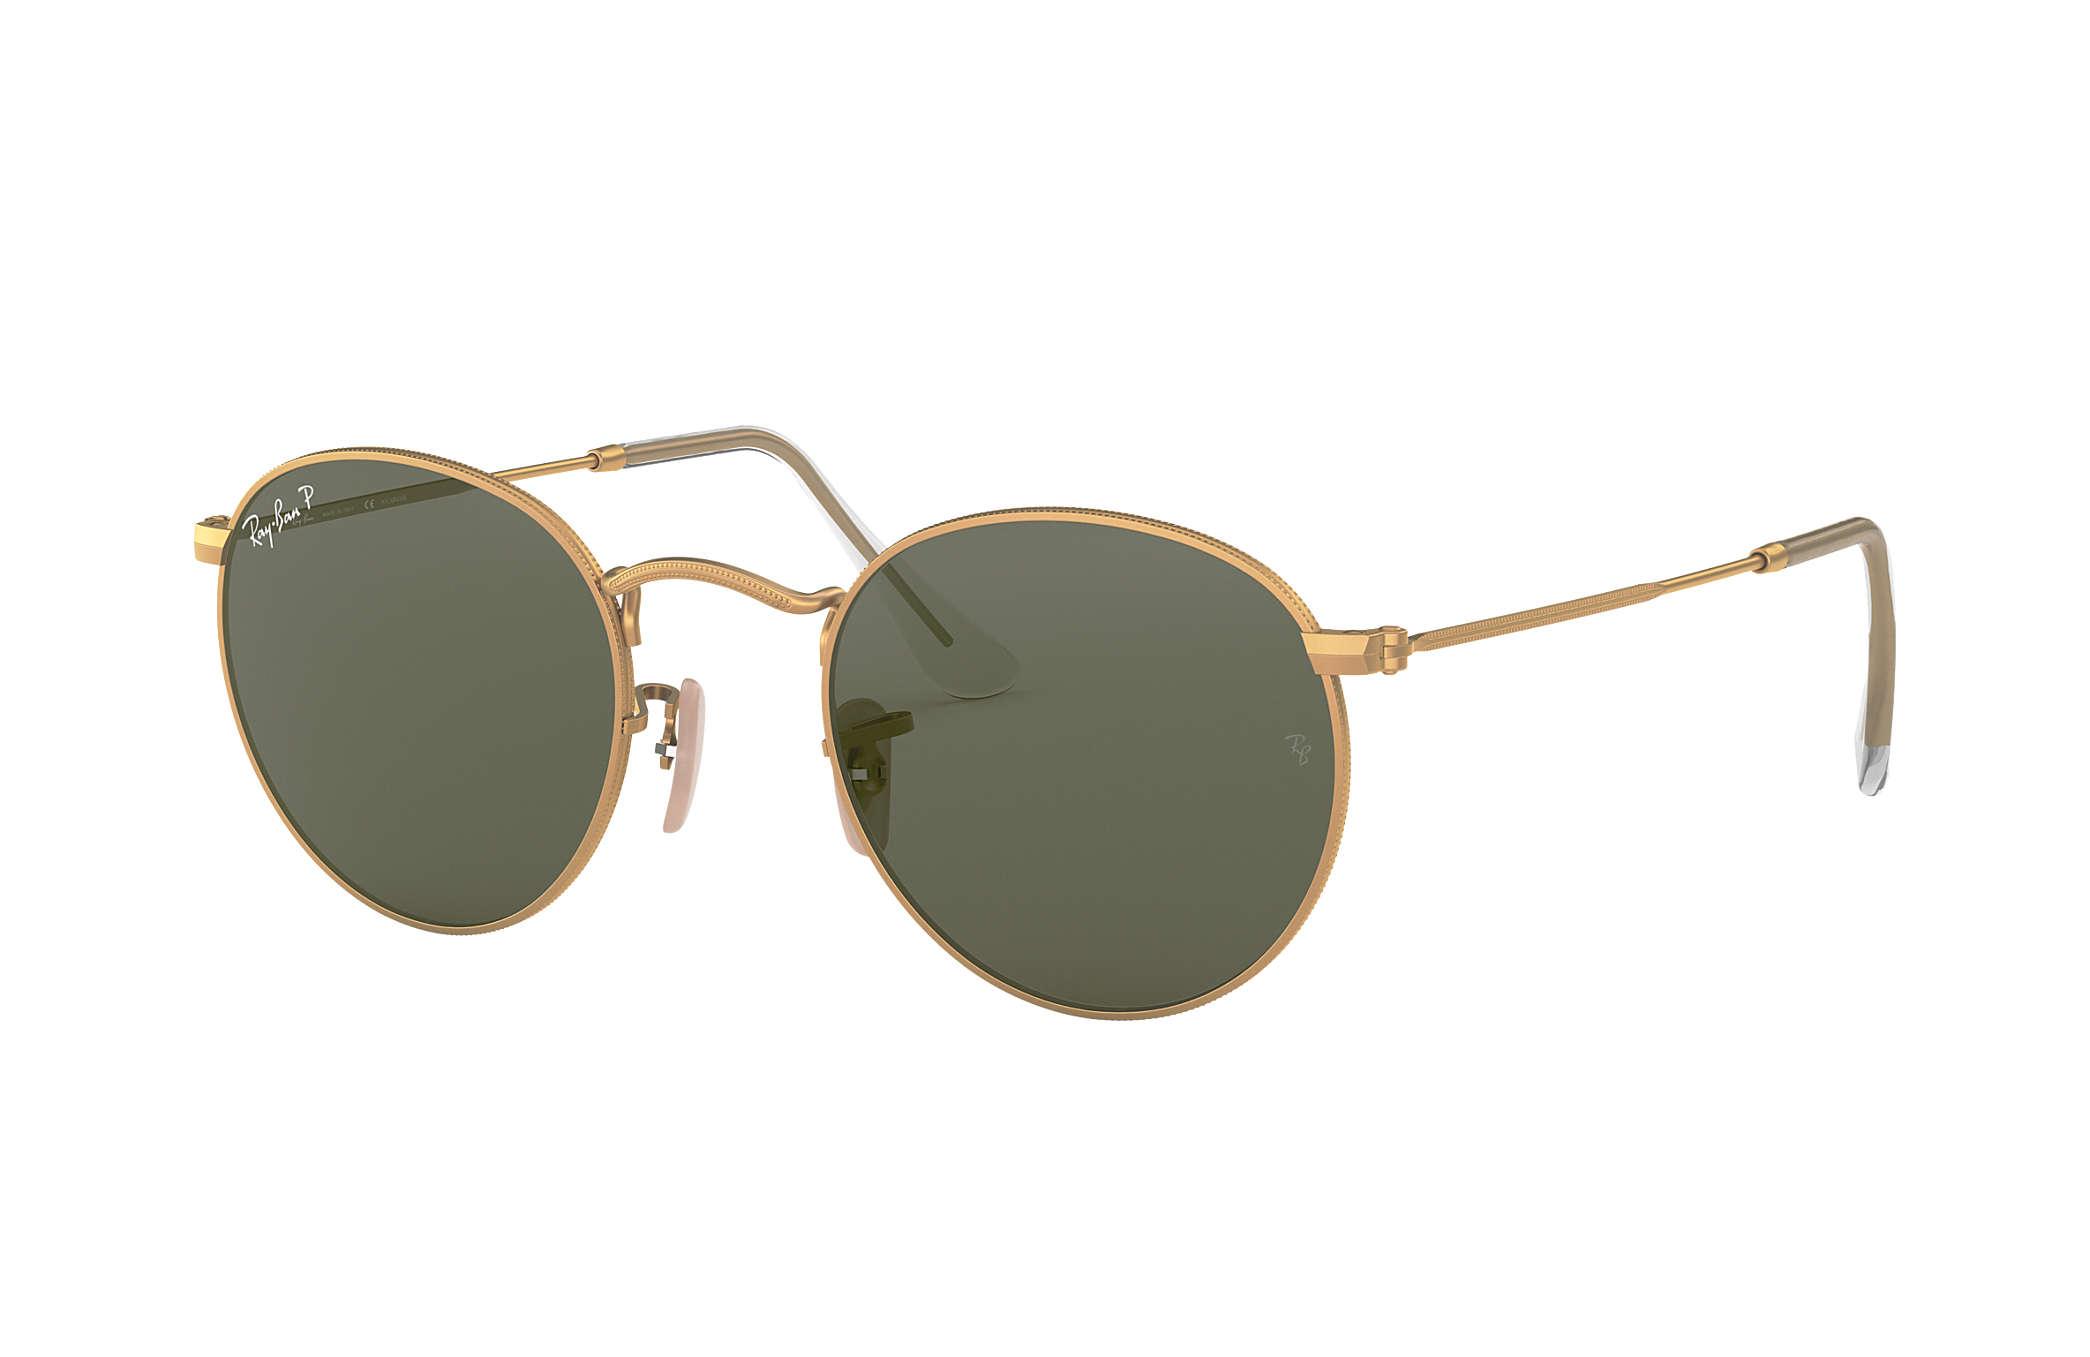 Ray-Ban Round Metal RB3447 Gold - Metal - Green Polarized Lenses ... 0c5170def40b